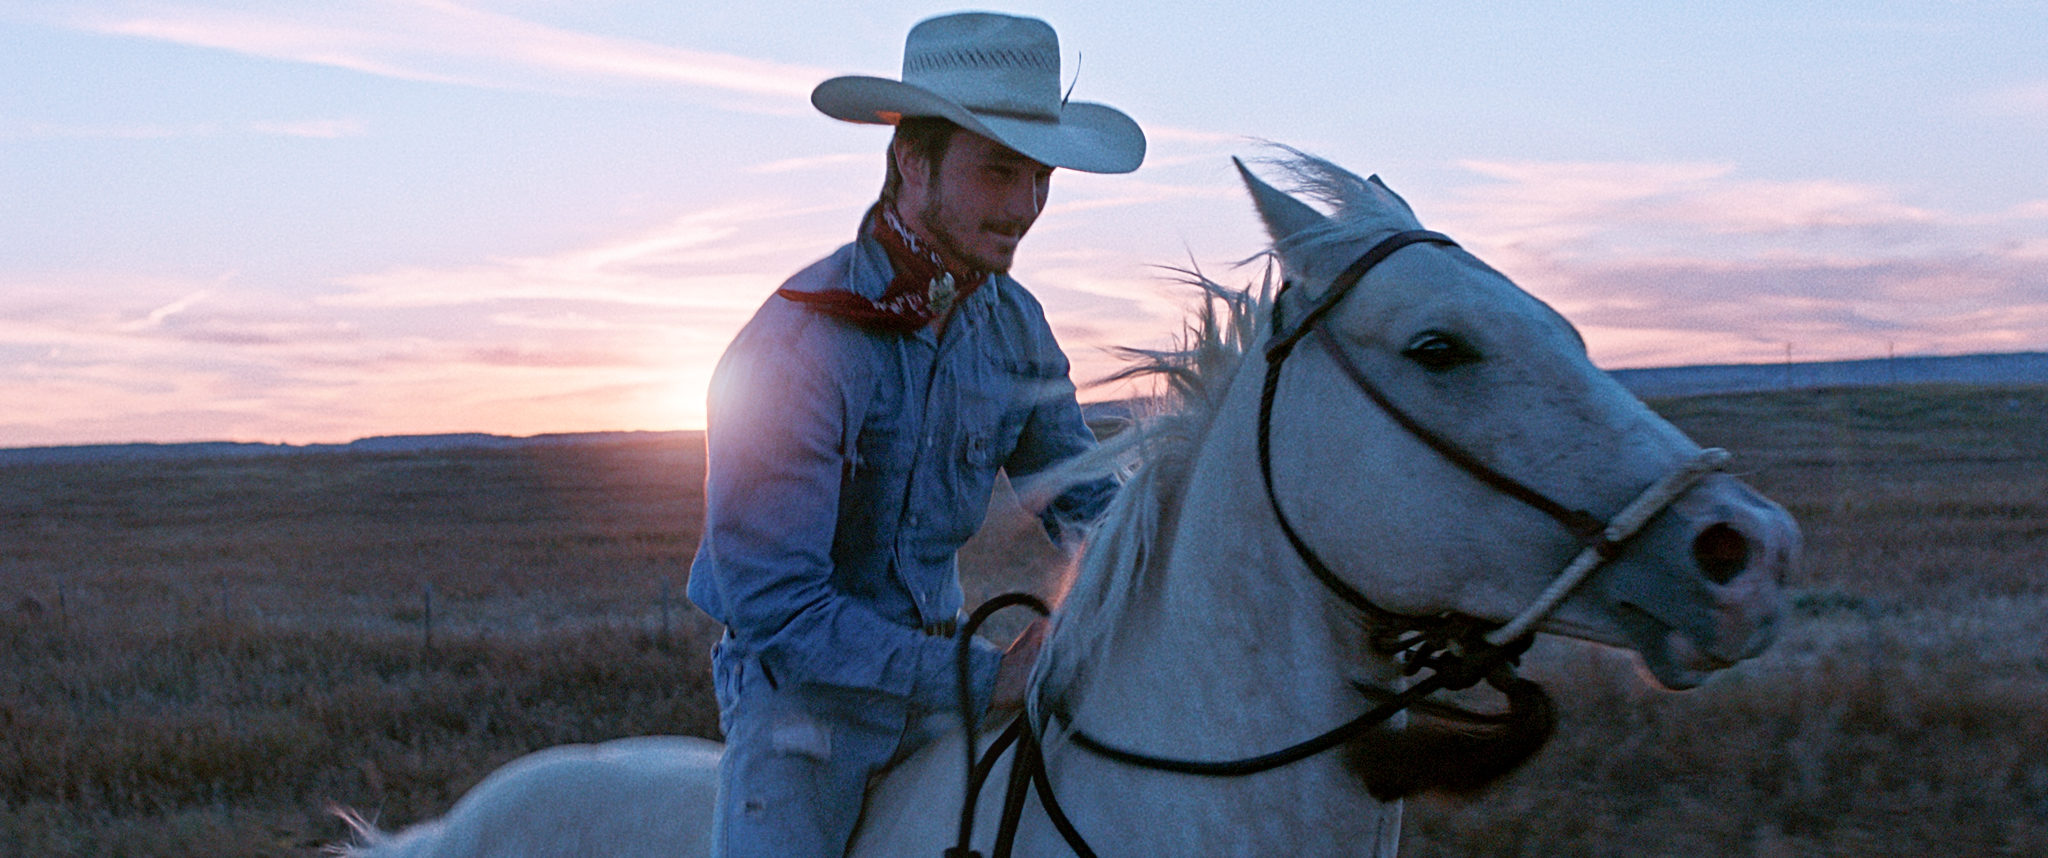 The Rider photo film 1